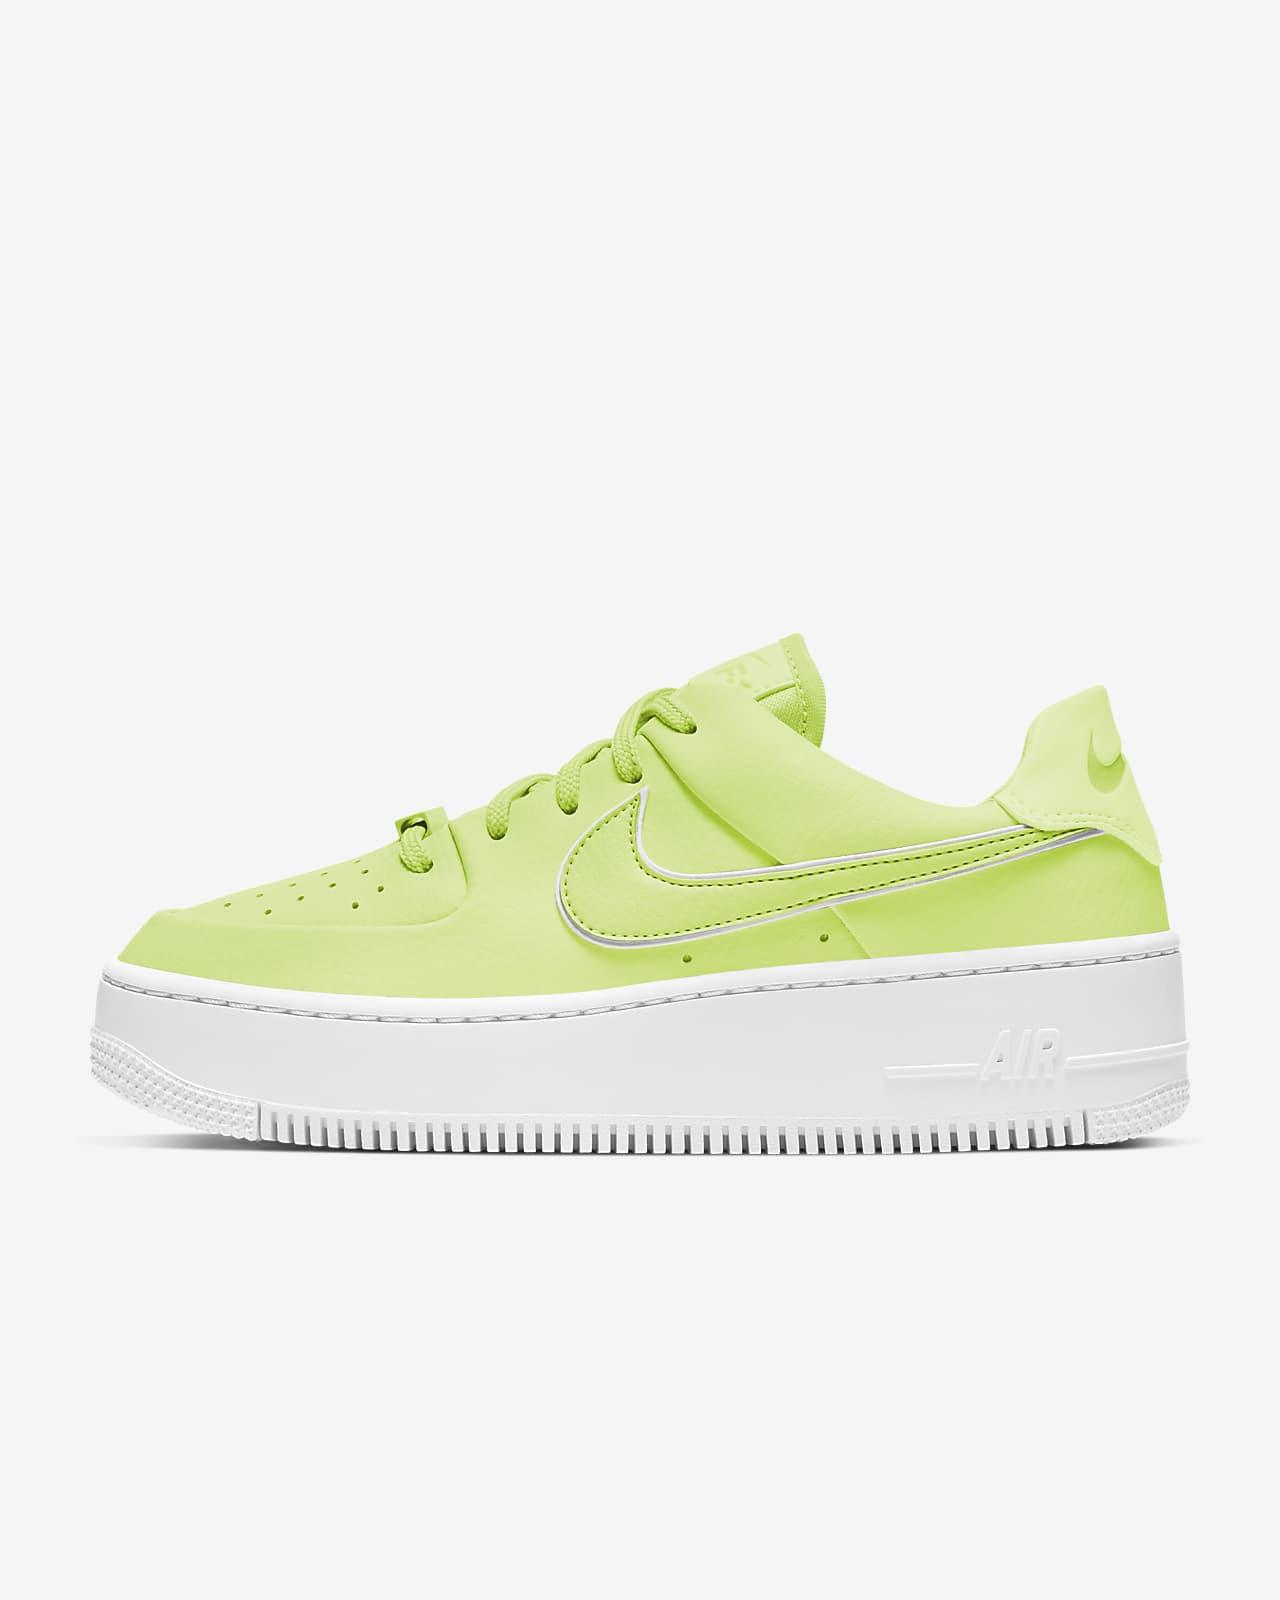 Nike Air Force 1 Sage Low Women's Shoe